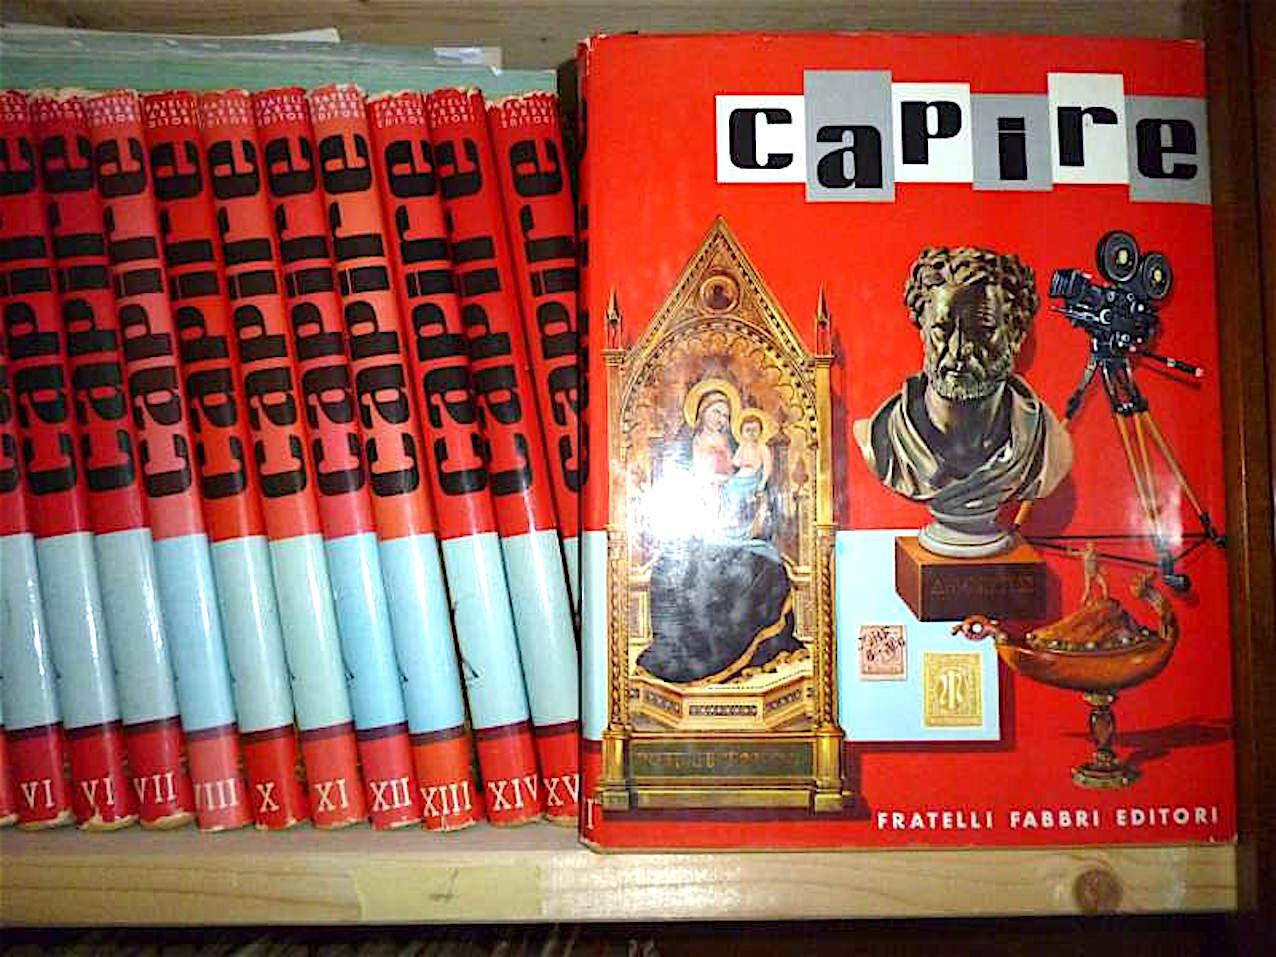 enciclopedia_capire_fabbri_editore_anni_60